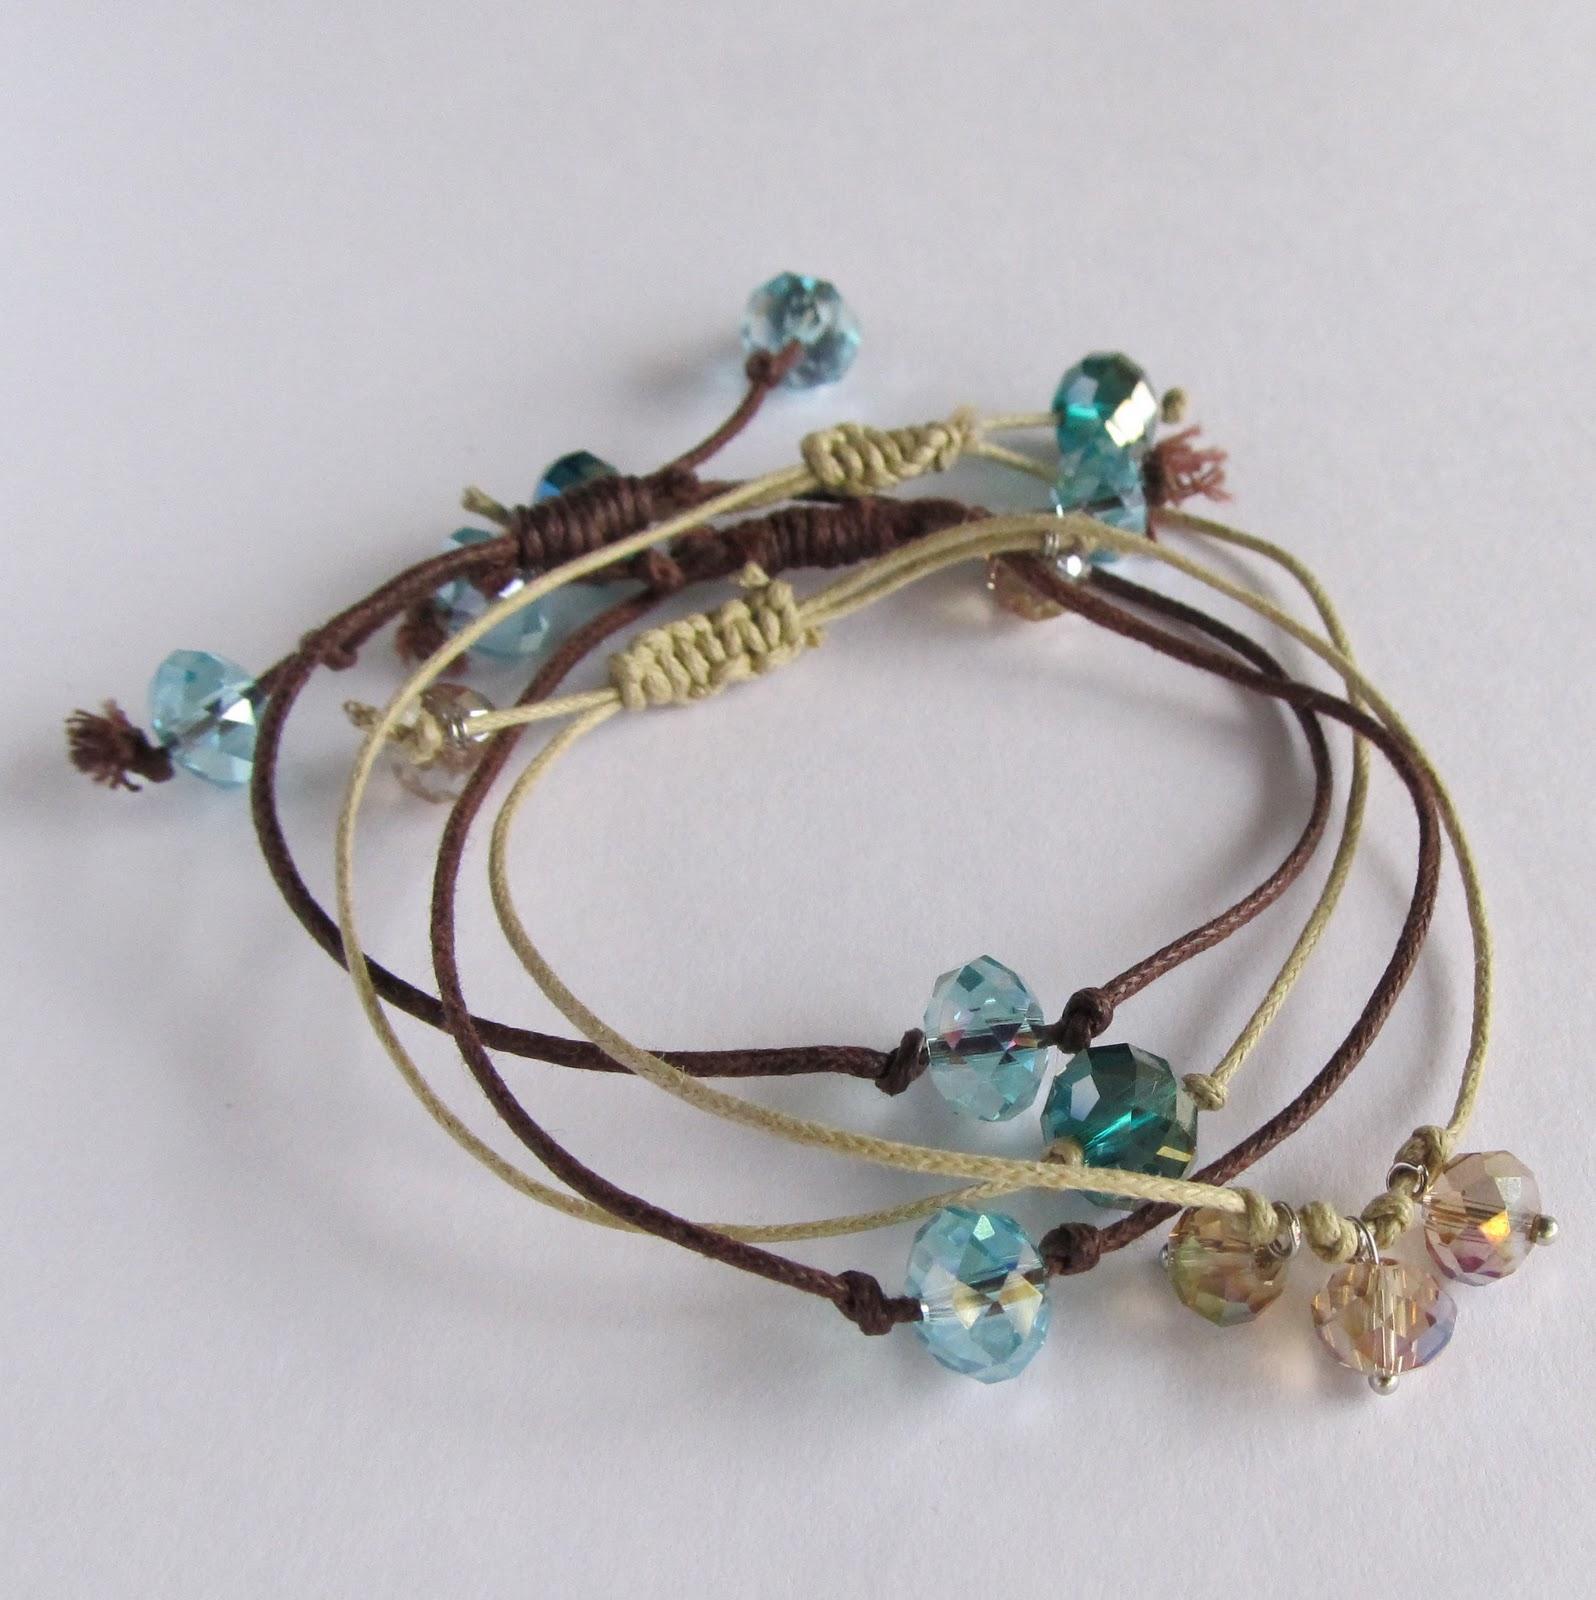 Wobisobi Crystal Bead Bracelet Diy